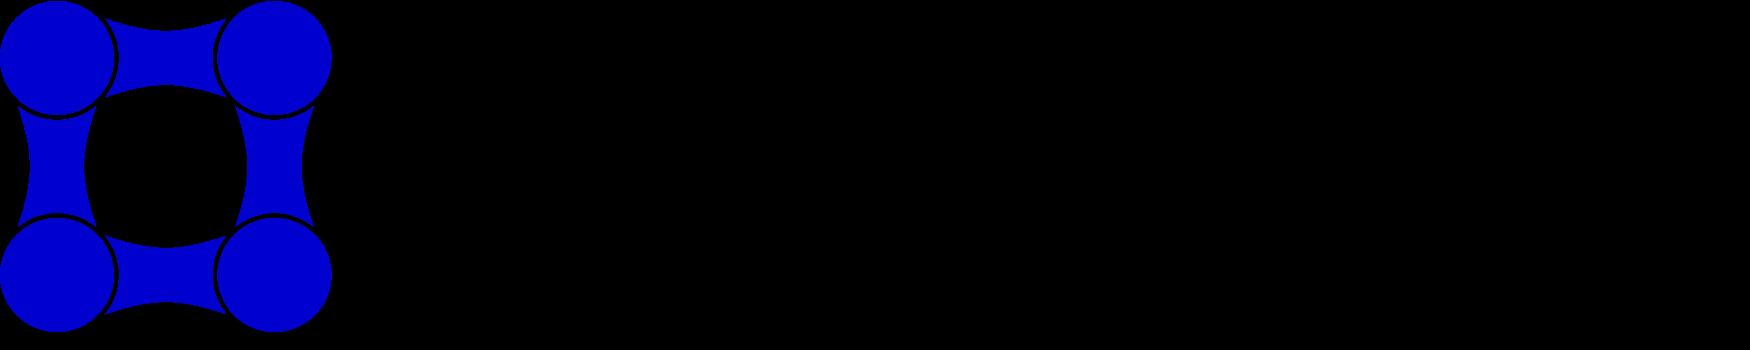 Natron Energy logo